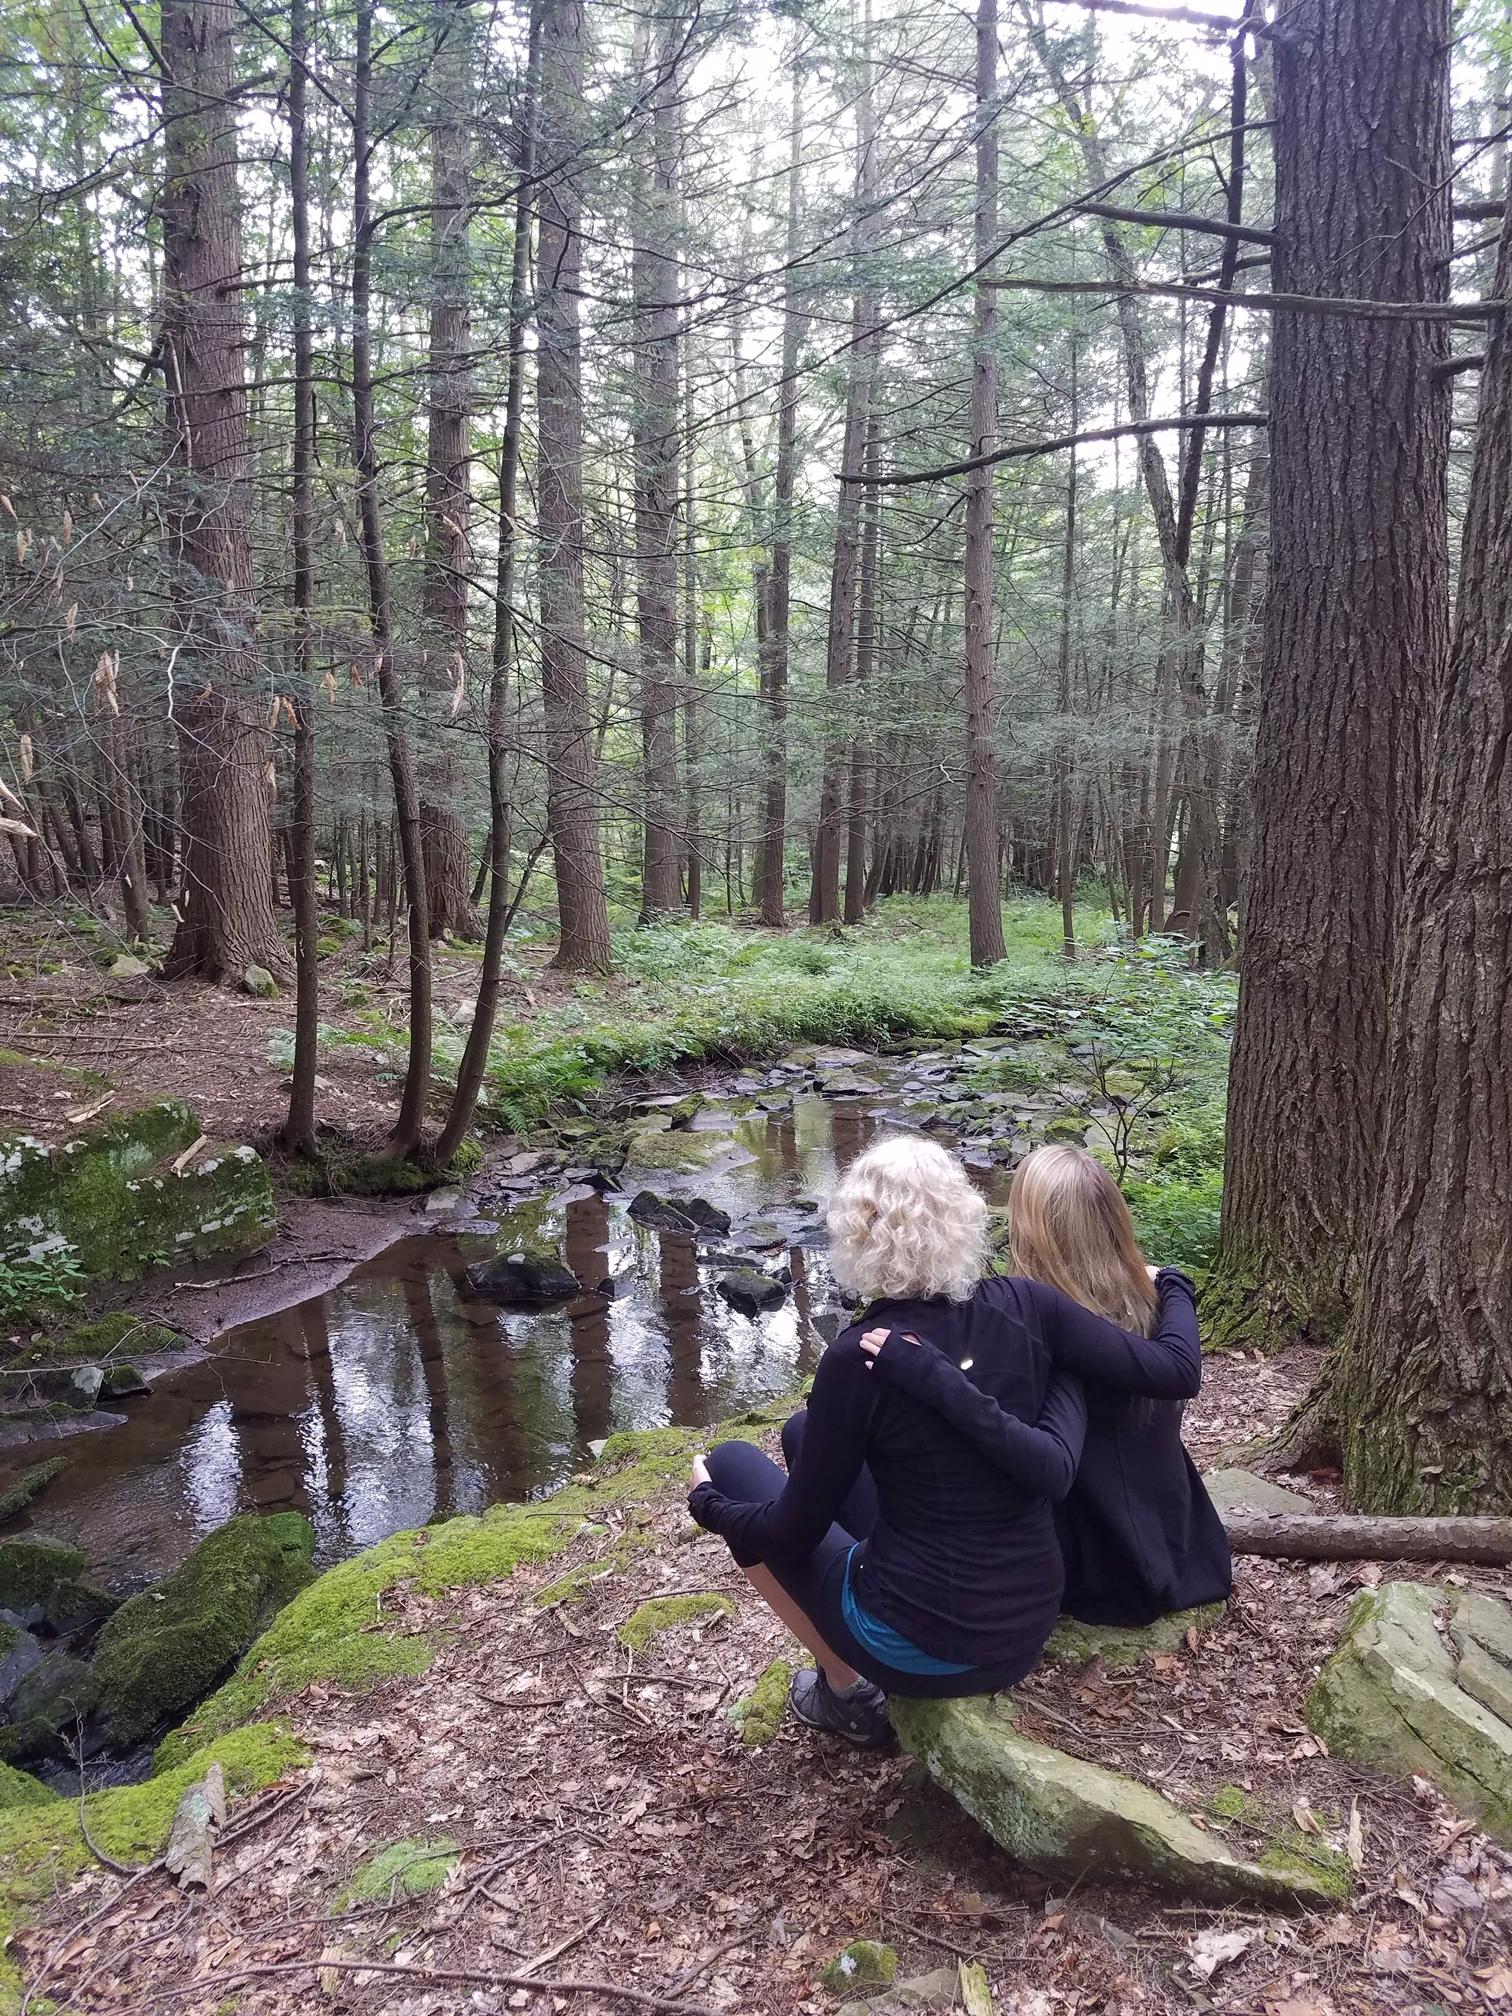 Lifepath Retreat: Yoga, Ayurveda & Hiking———— August 23-25, 2019